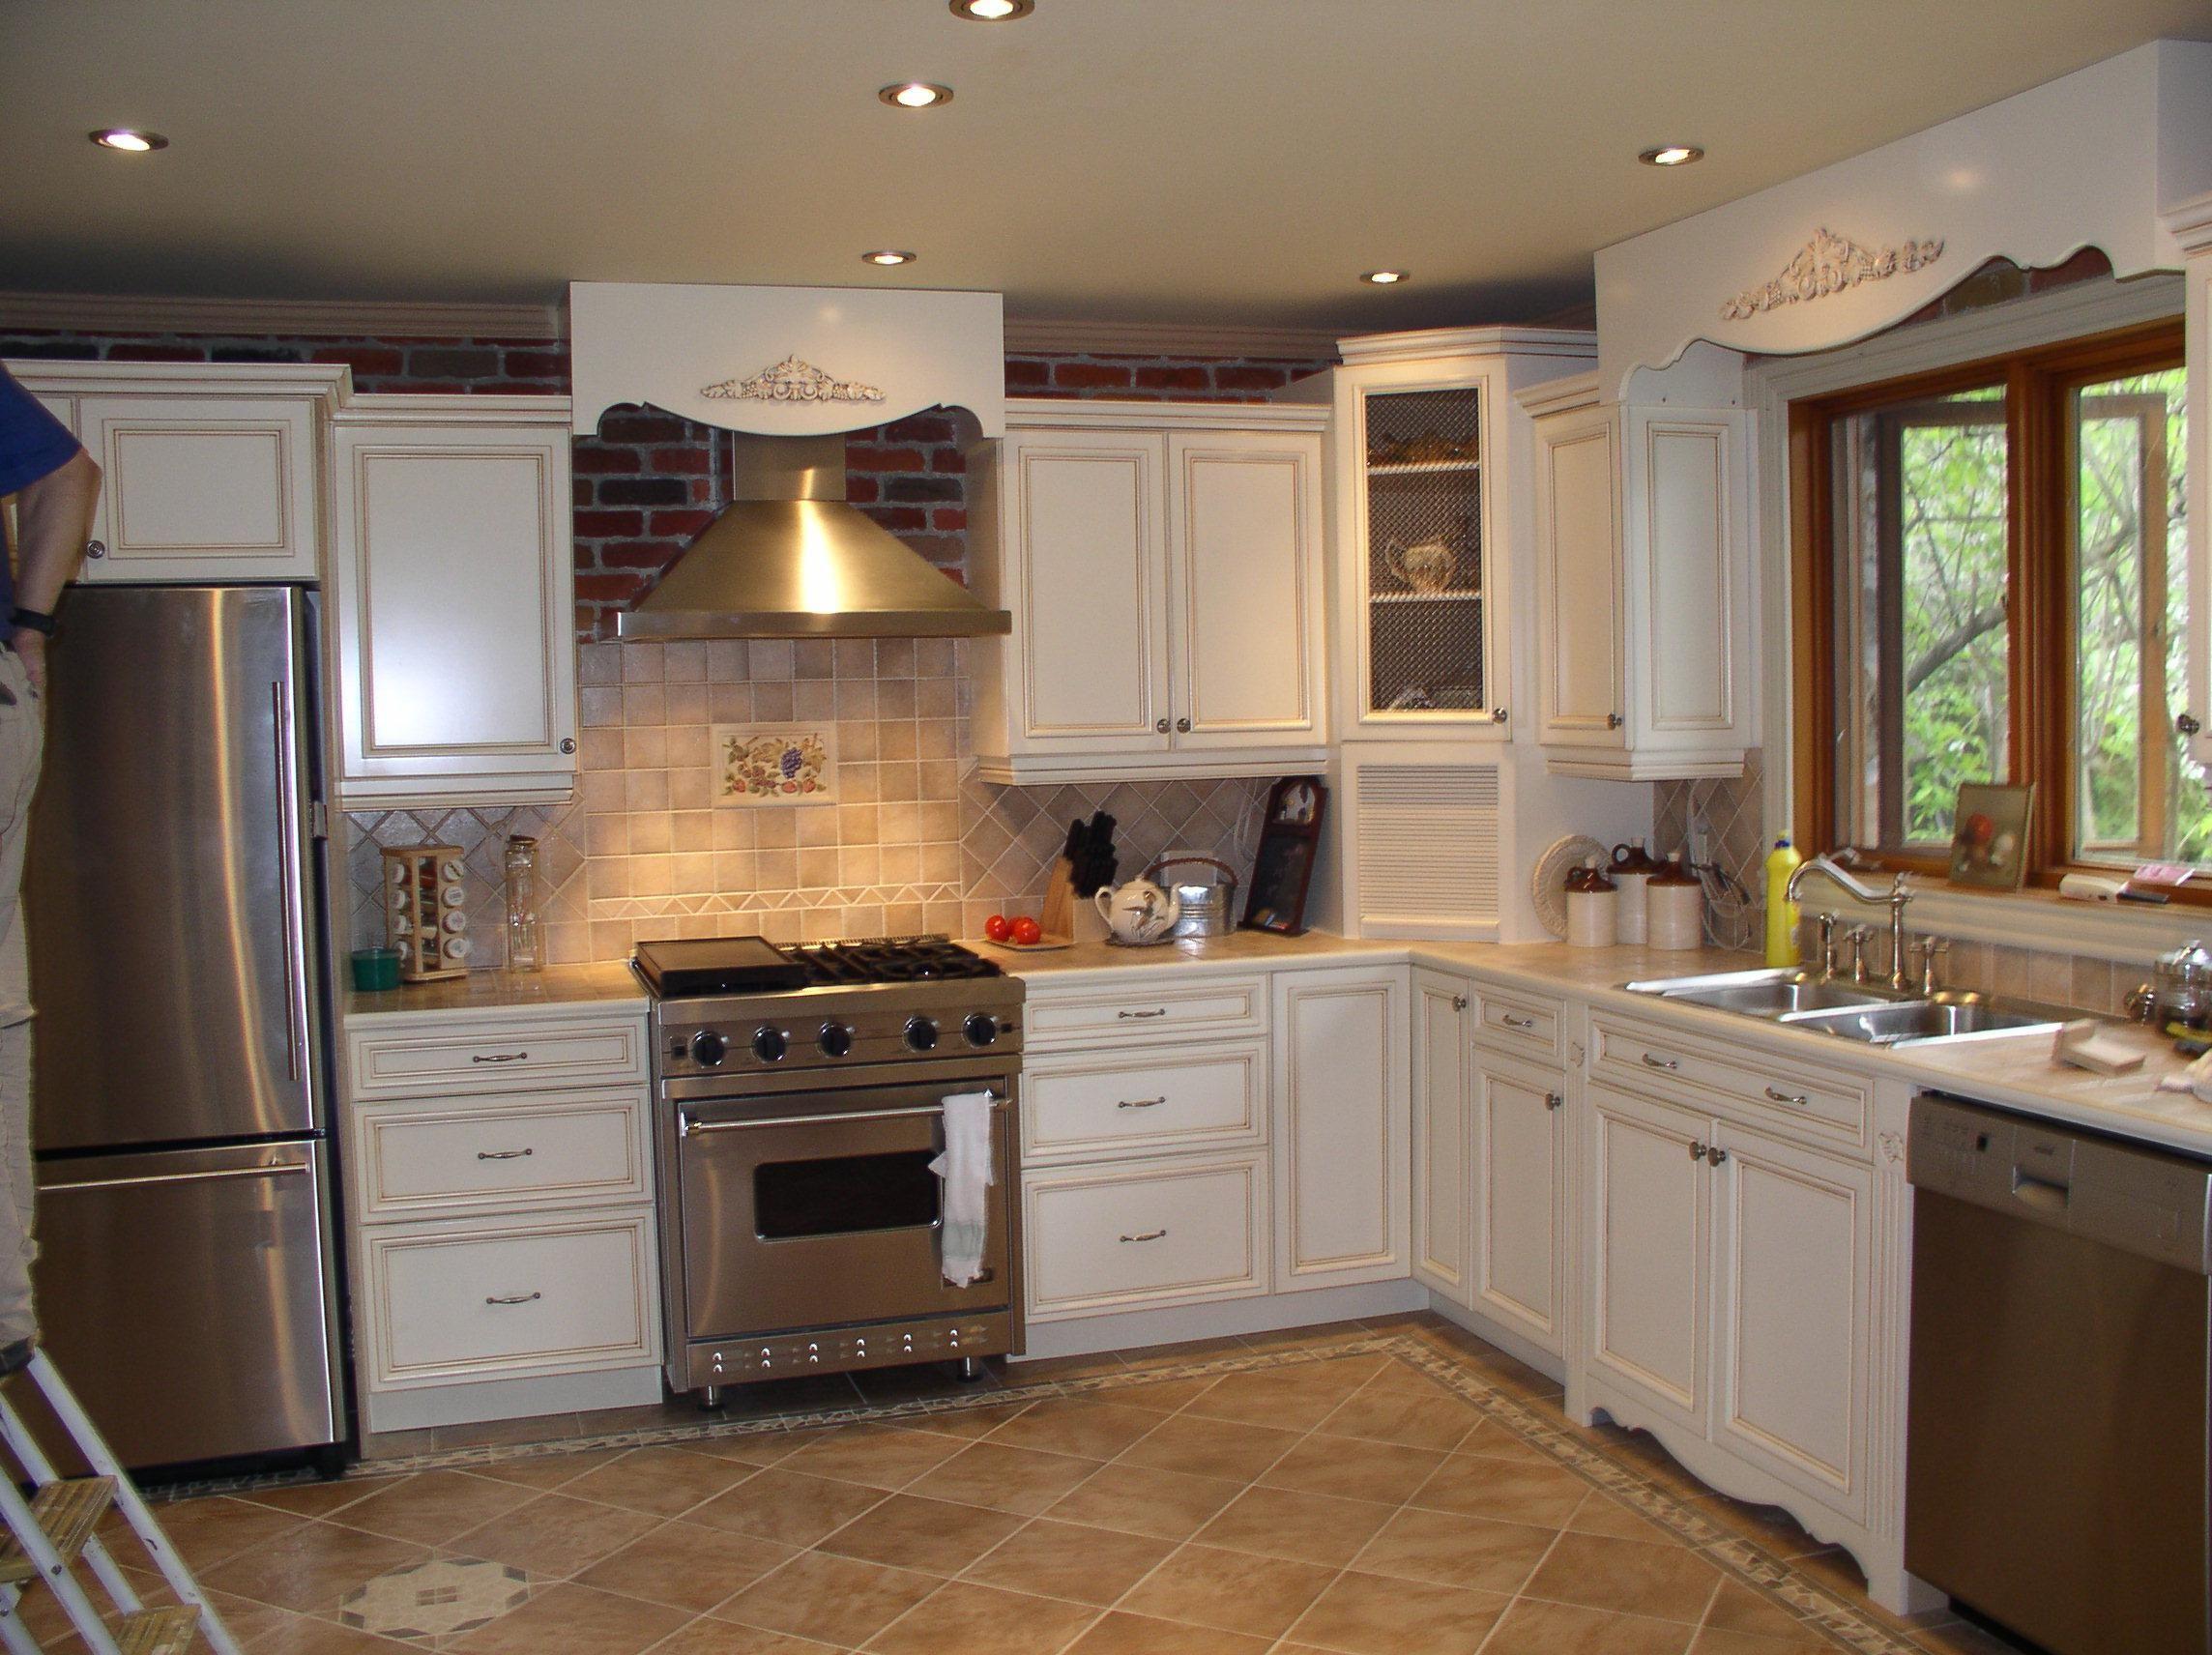 Antique White Kitchen Cabinets Amazing Photos Gallery Antique